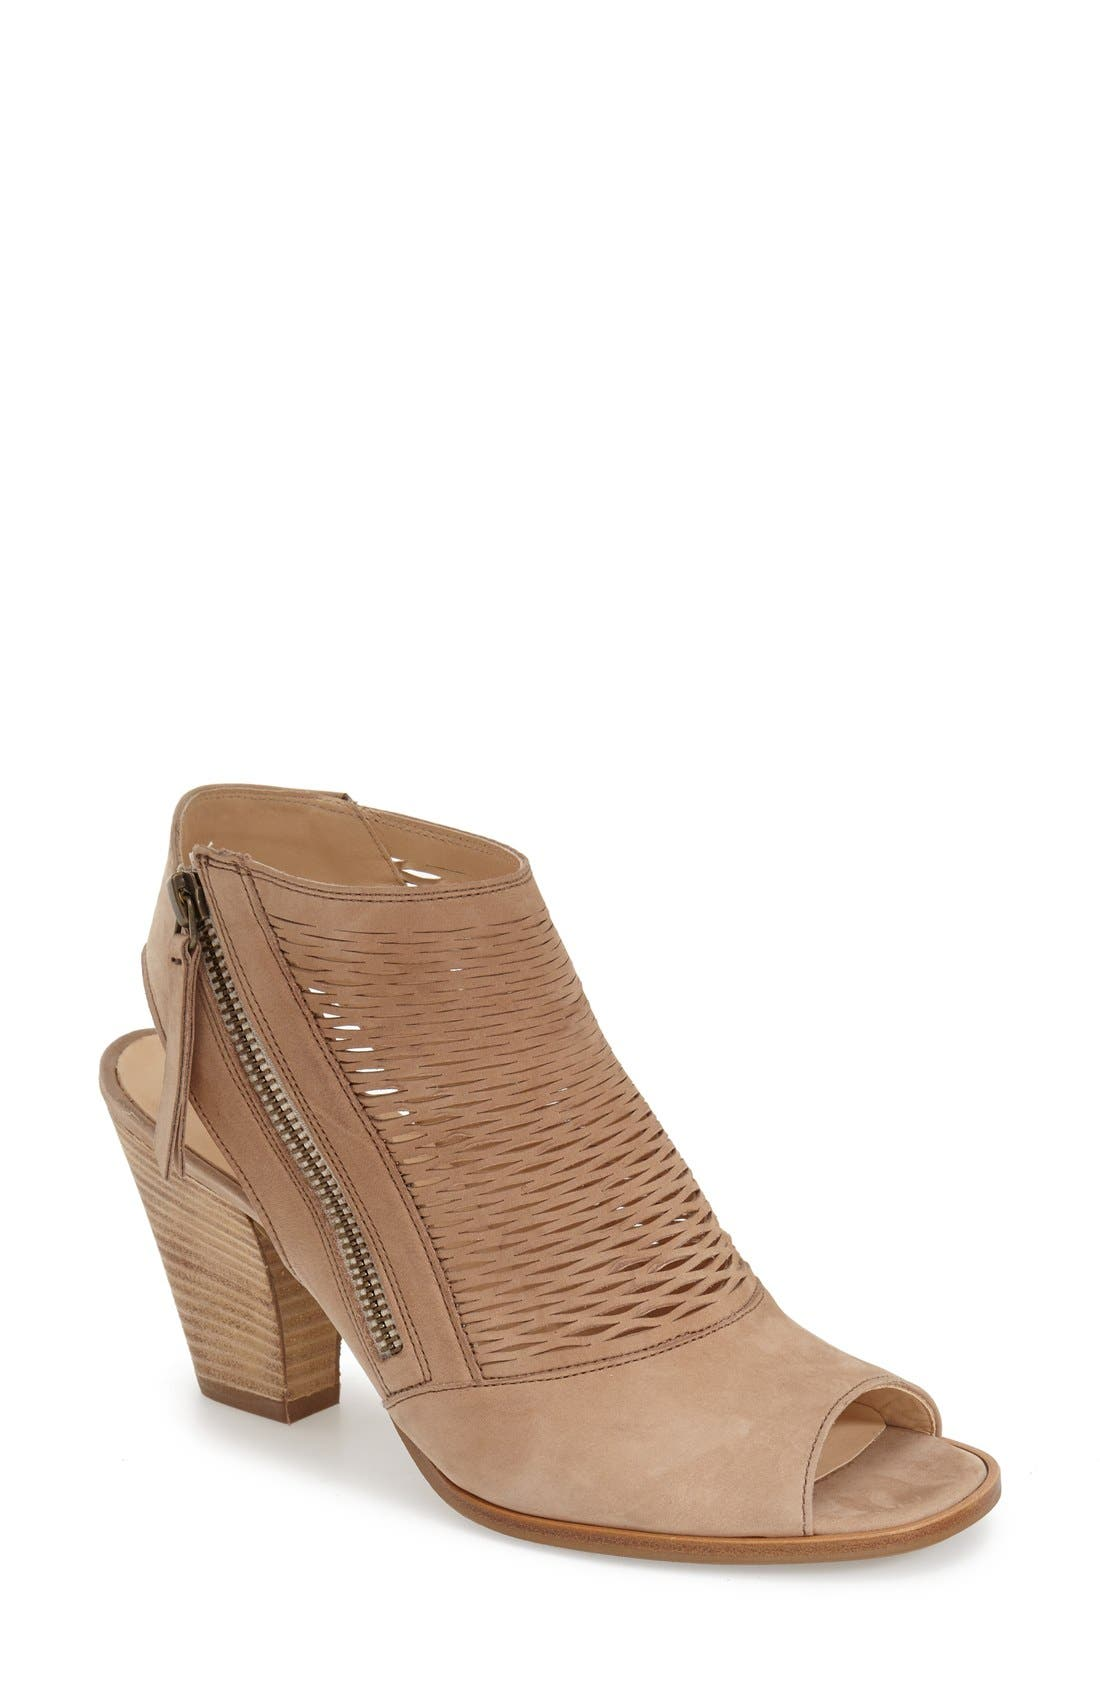 'Willow' Peep Toe Sandal,                         Main,                         color, Sisal Leather